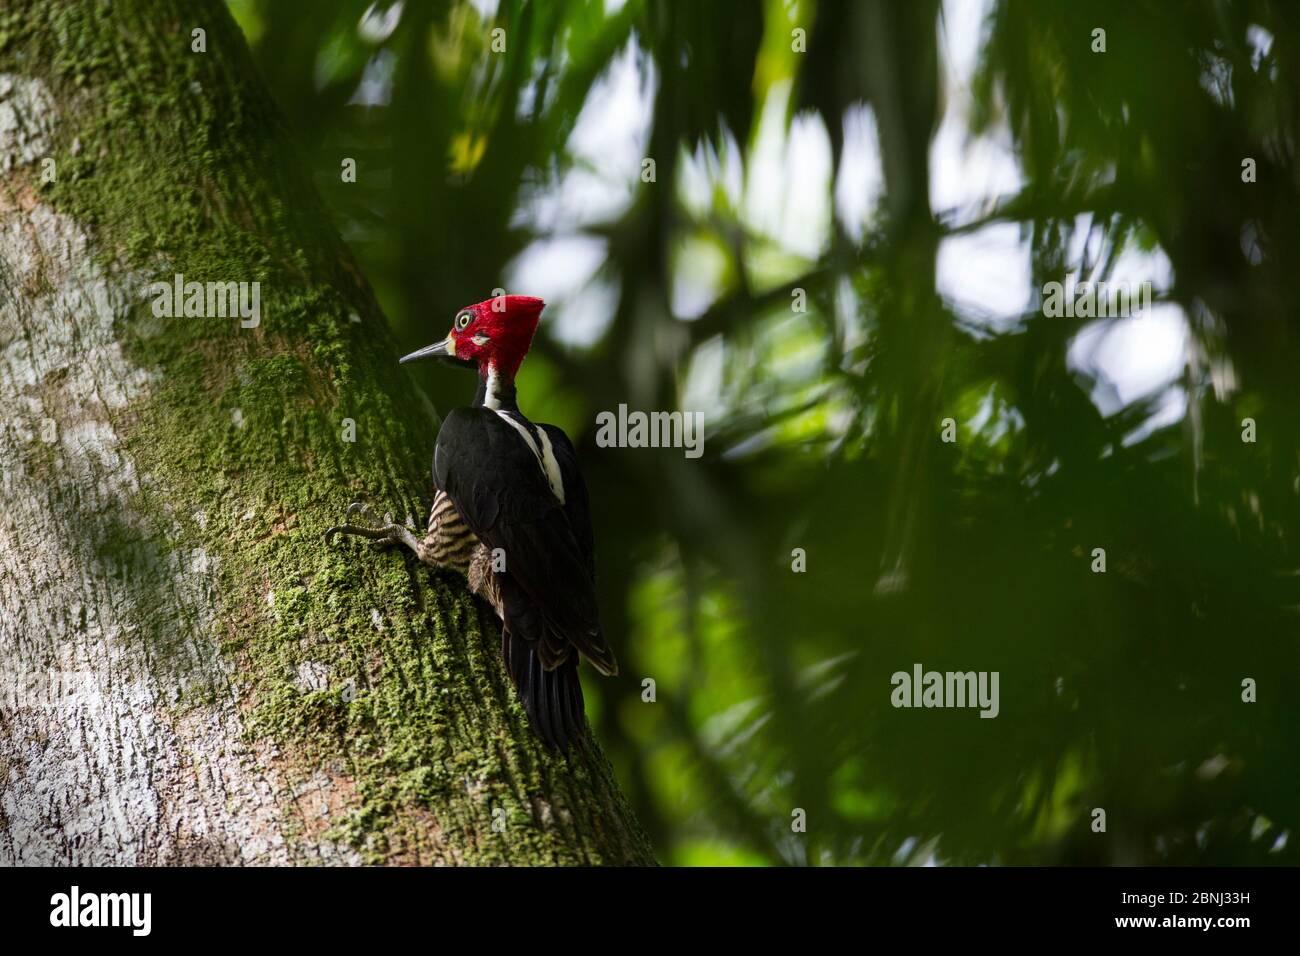 Crimson-crested woodpecker (Campephilus melanoleucos) on tree, tropical rainforest. Barro Colorado Island, Gatun Lake, Panama Canal, Panama. Stock Photo